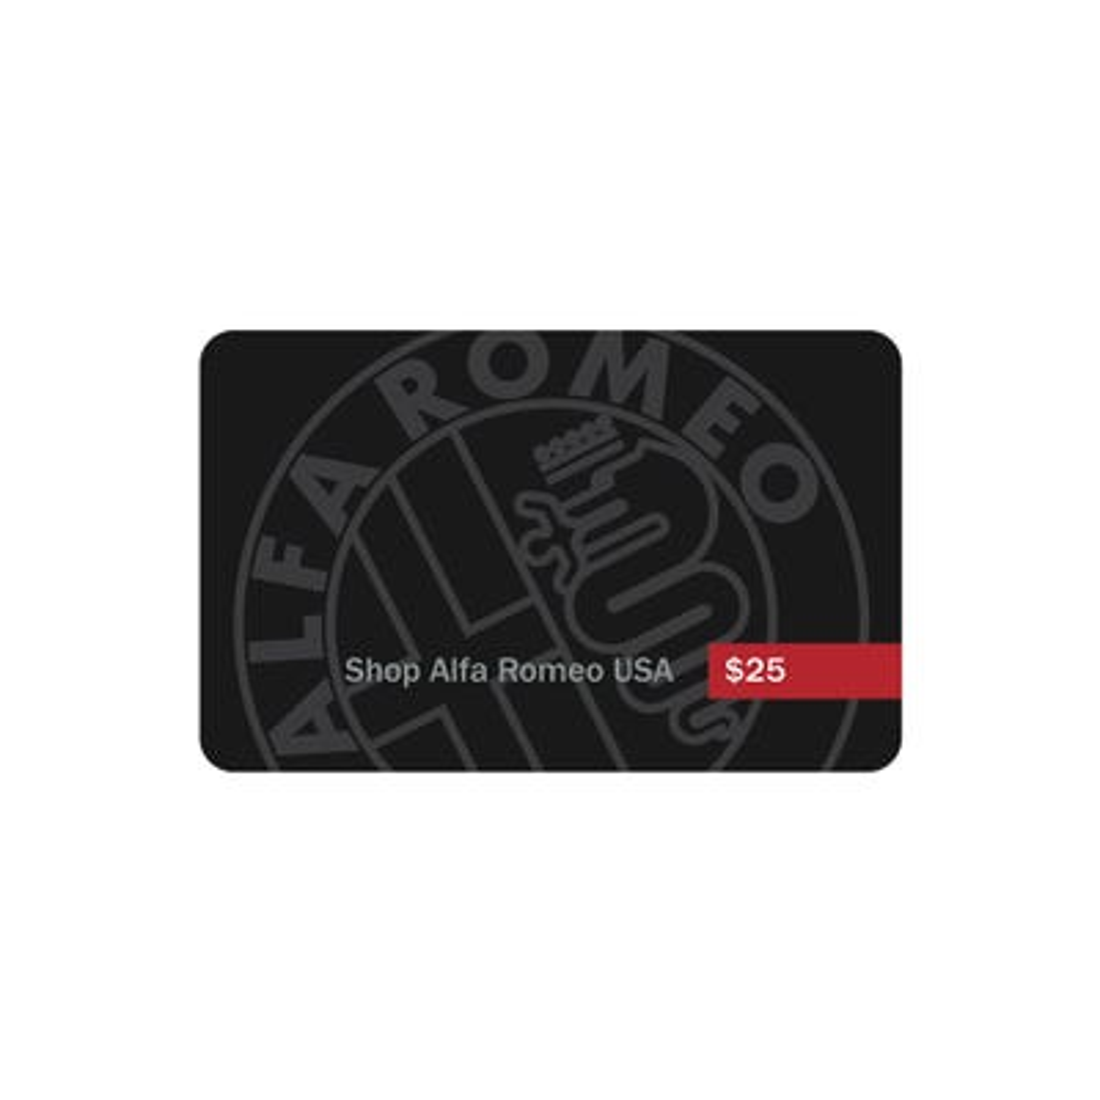 $25 Alfa Romeo Gift Card